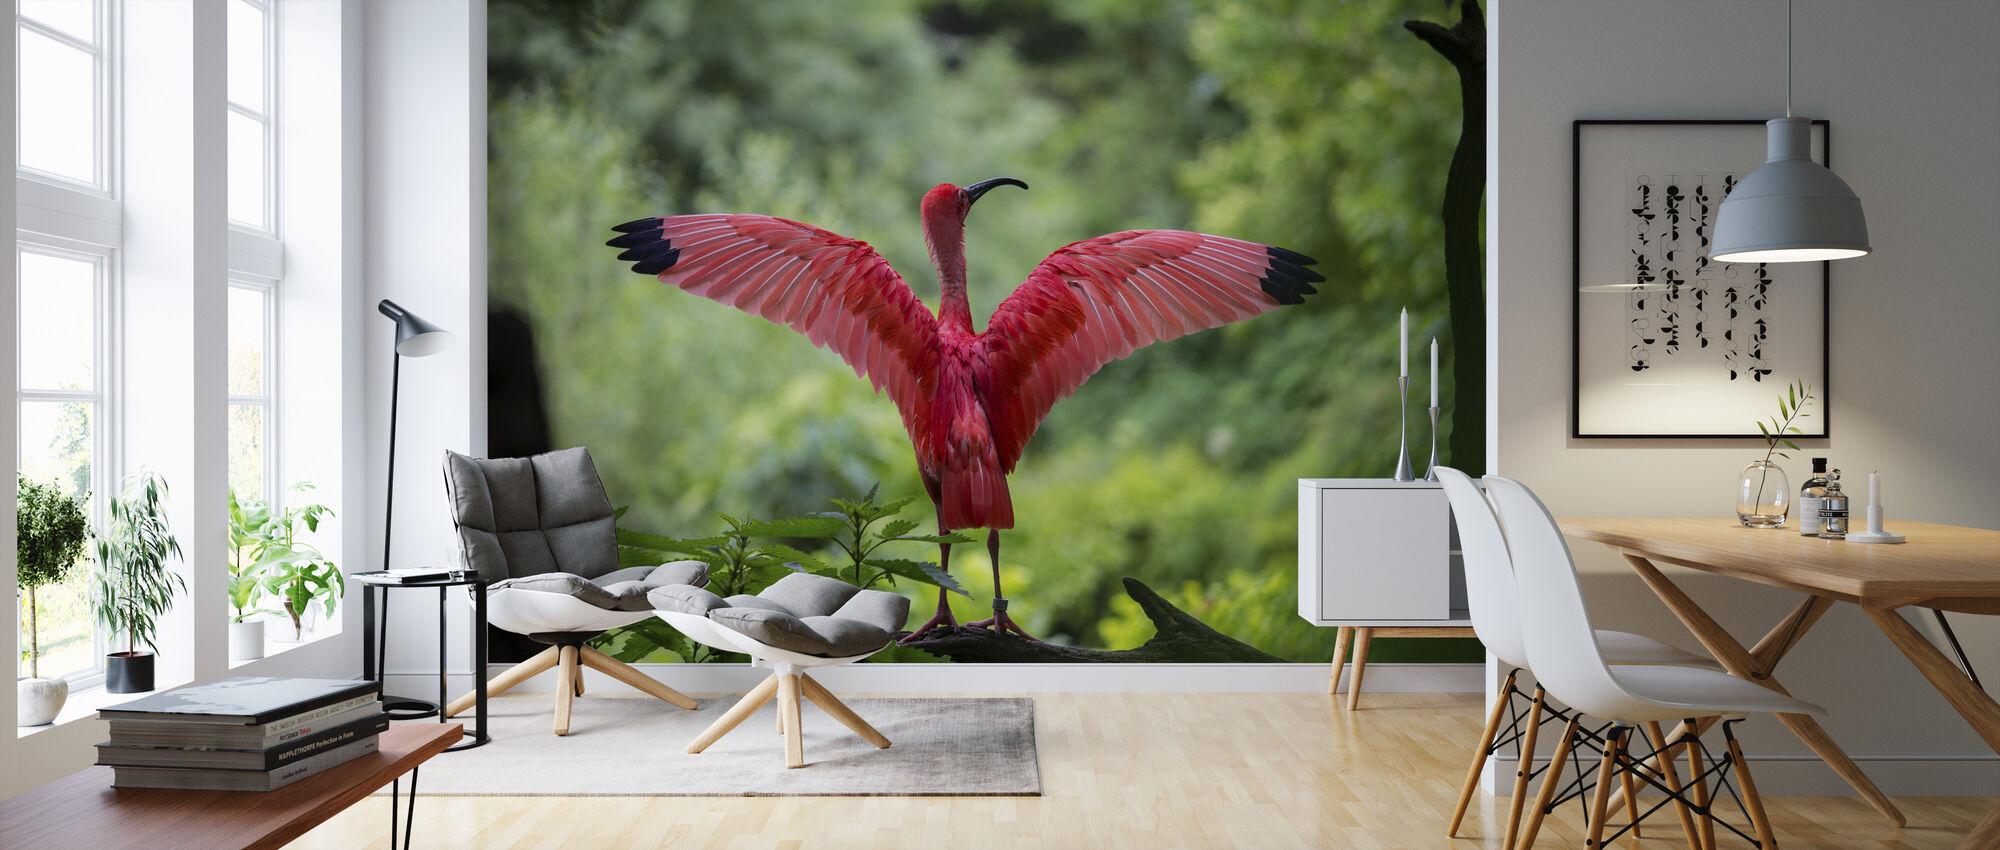 Beautiful Bird - Wallpaper - Living Room